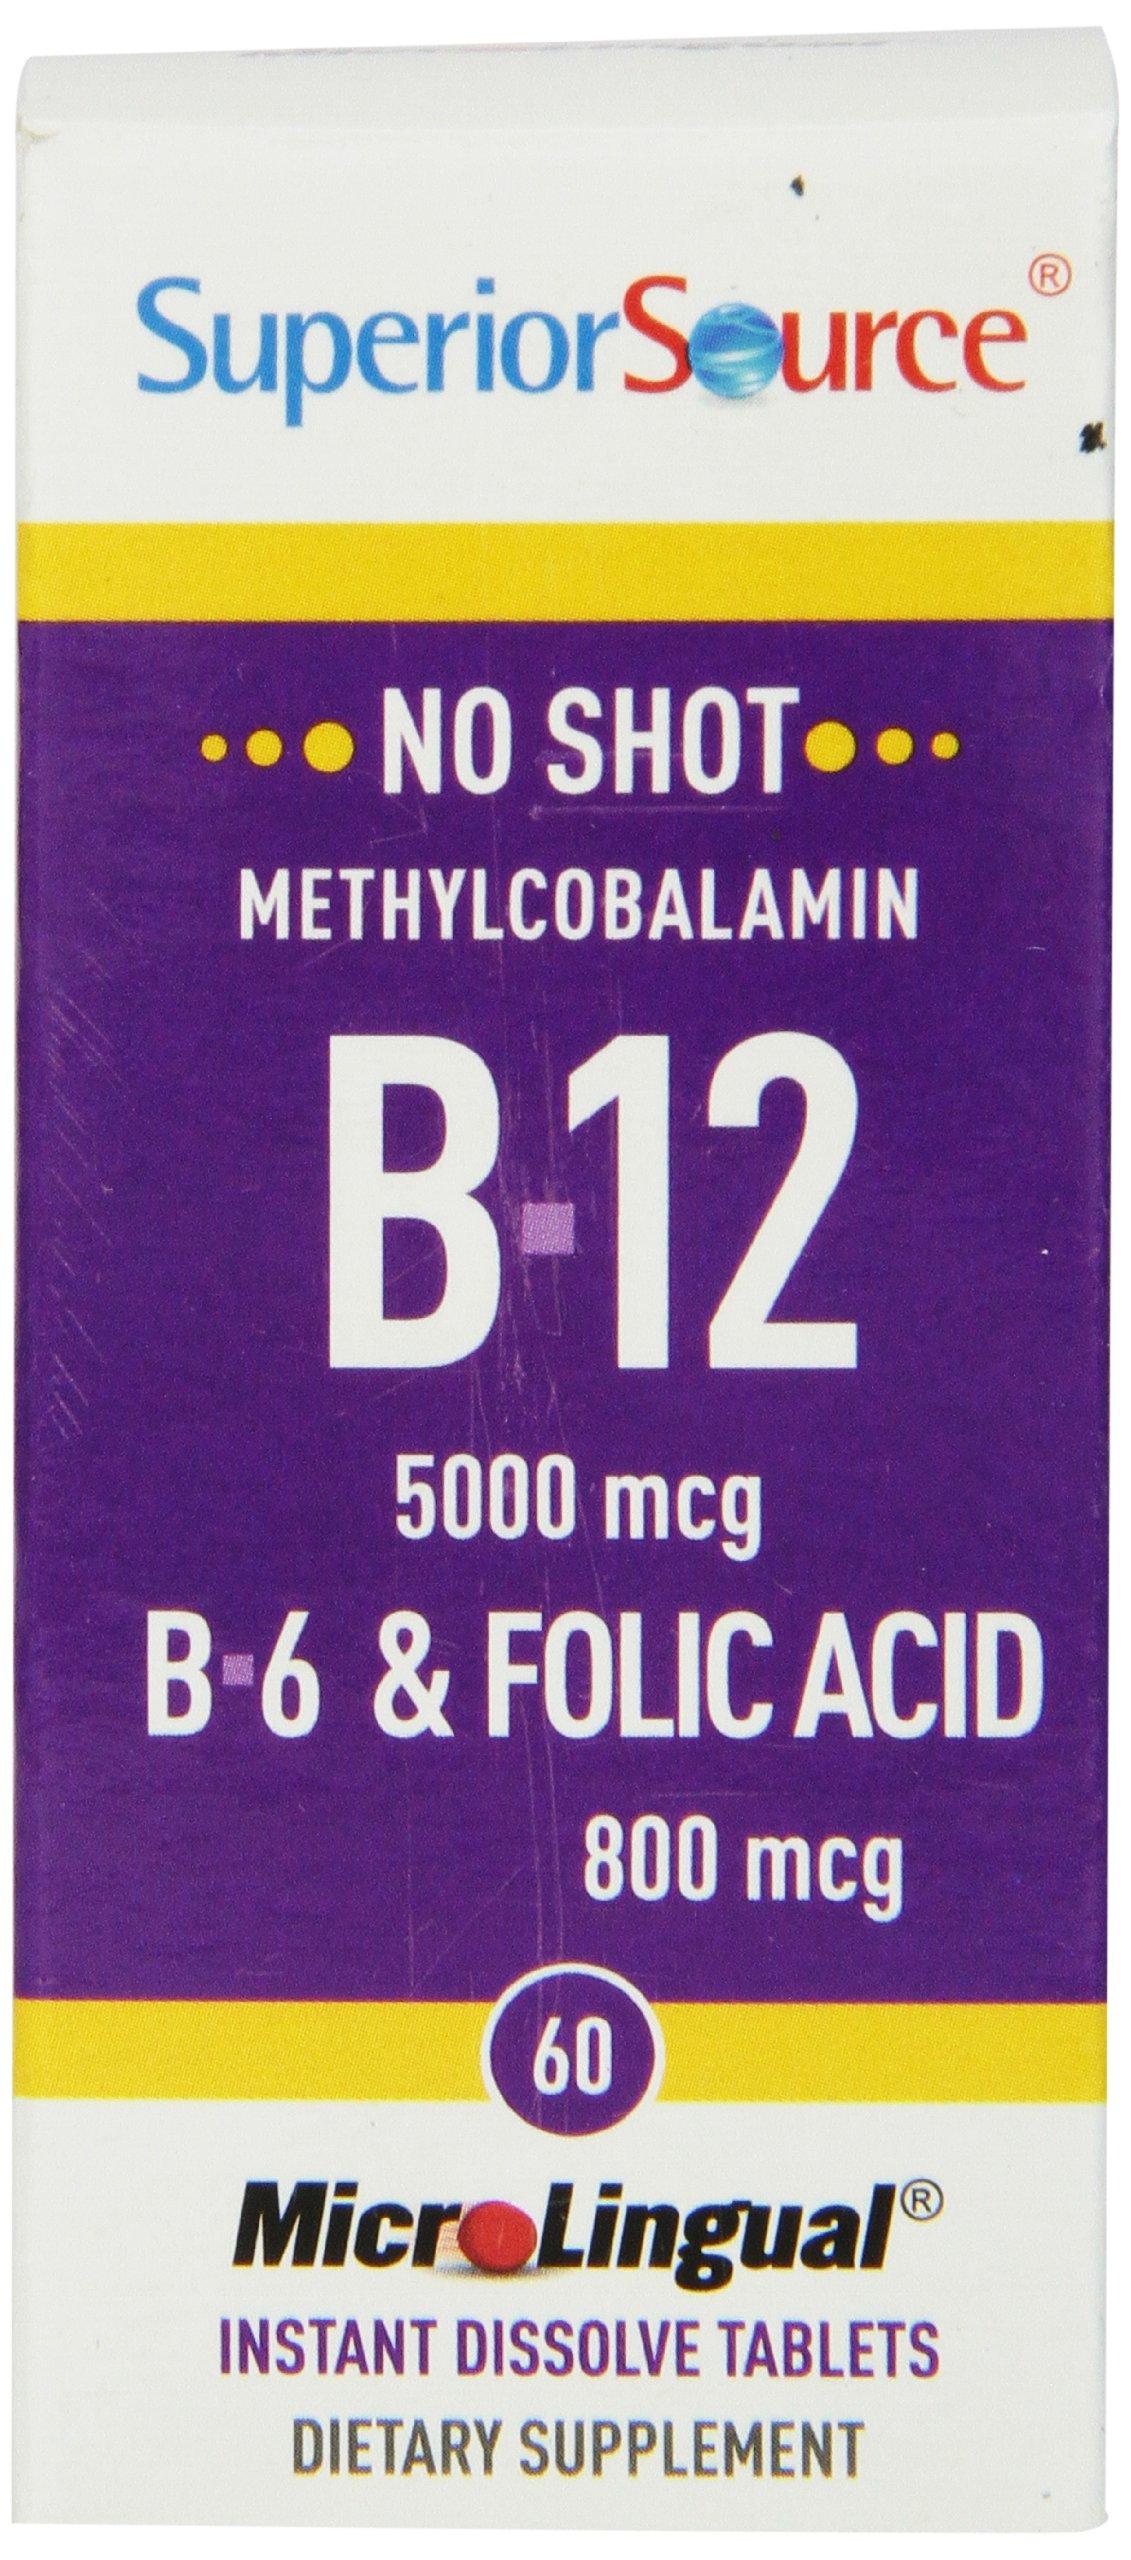 Superior Source No Shot Methylcobalamin Vitamin B12/B6/Folic Acid Tablets, 5000 mcg/800 mcg, 60 Count